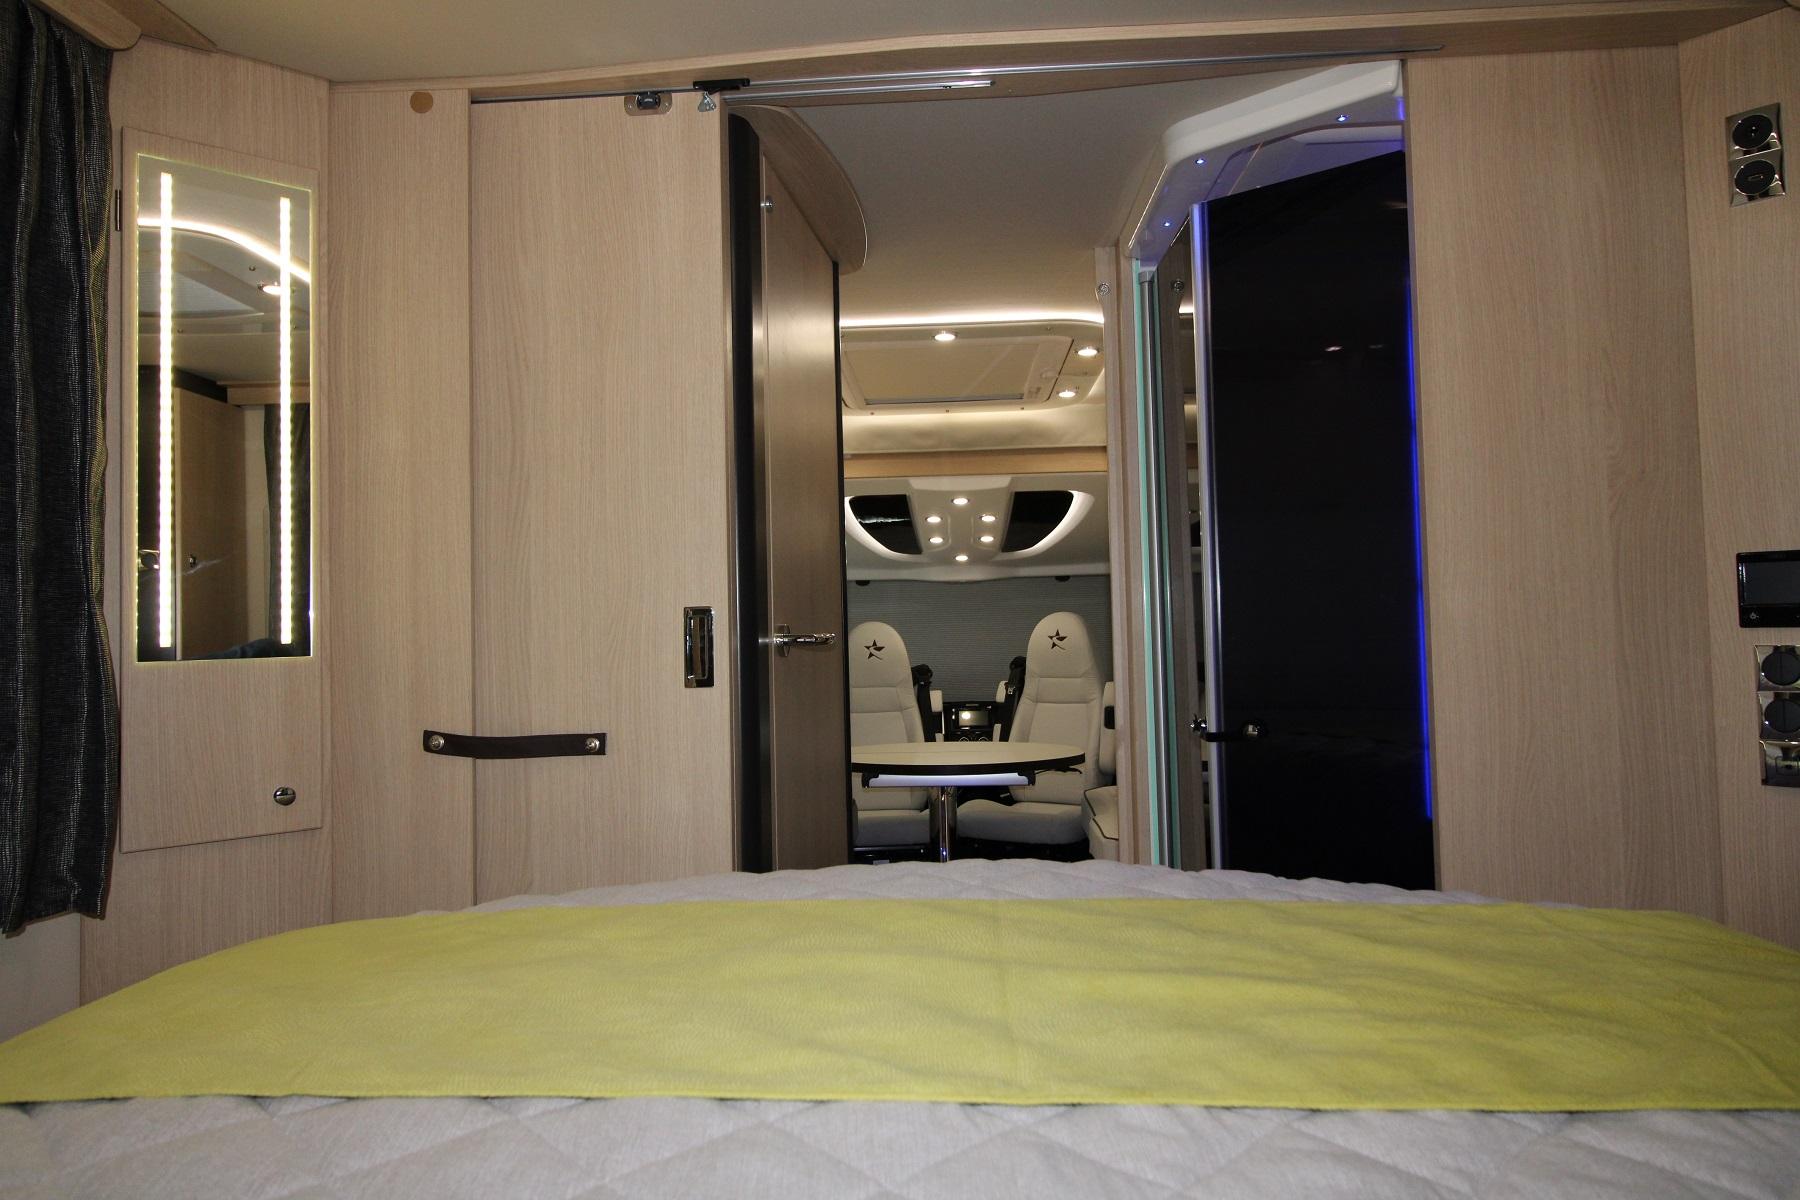 Autostar I730 Lc Prestige Design Edition - 10